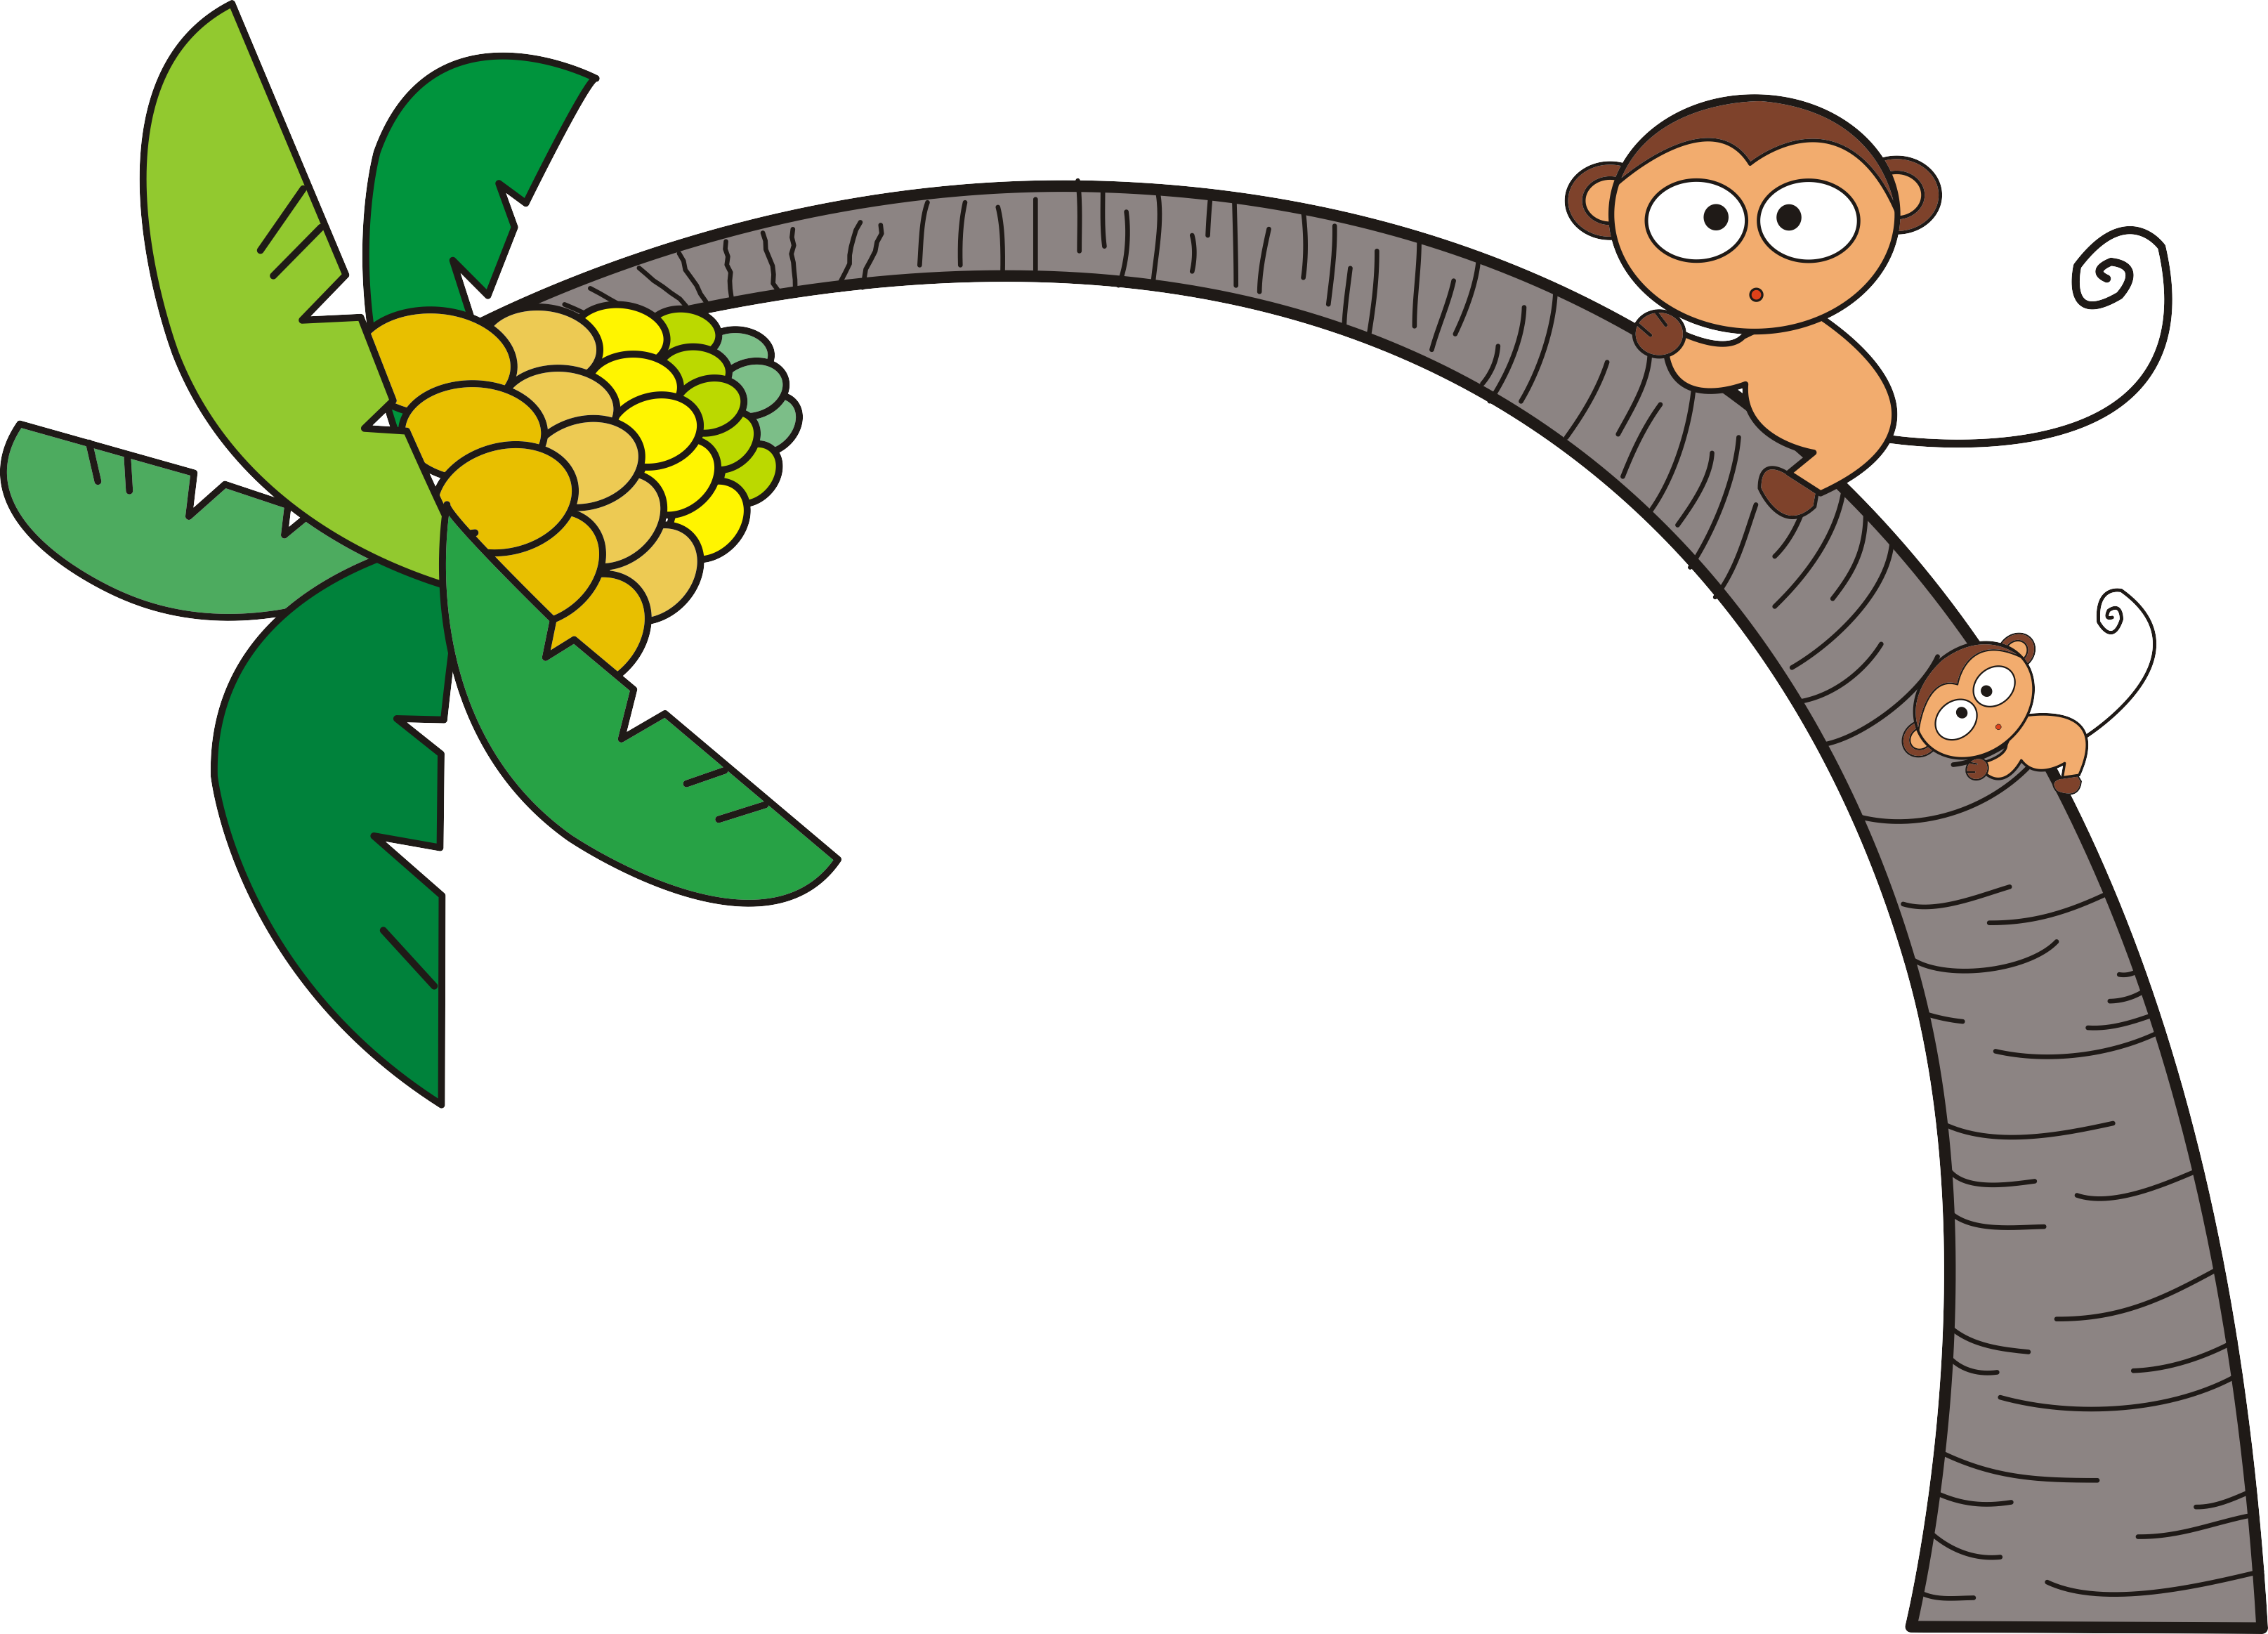 Tree Clip Art Coconut Monkey Transprent Png - ลิง ปี น ...